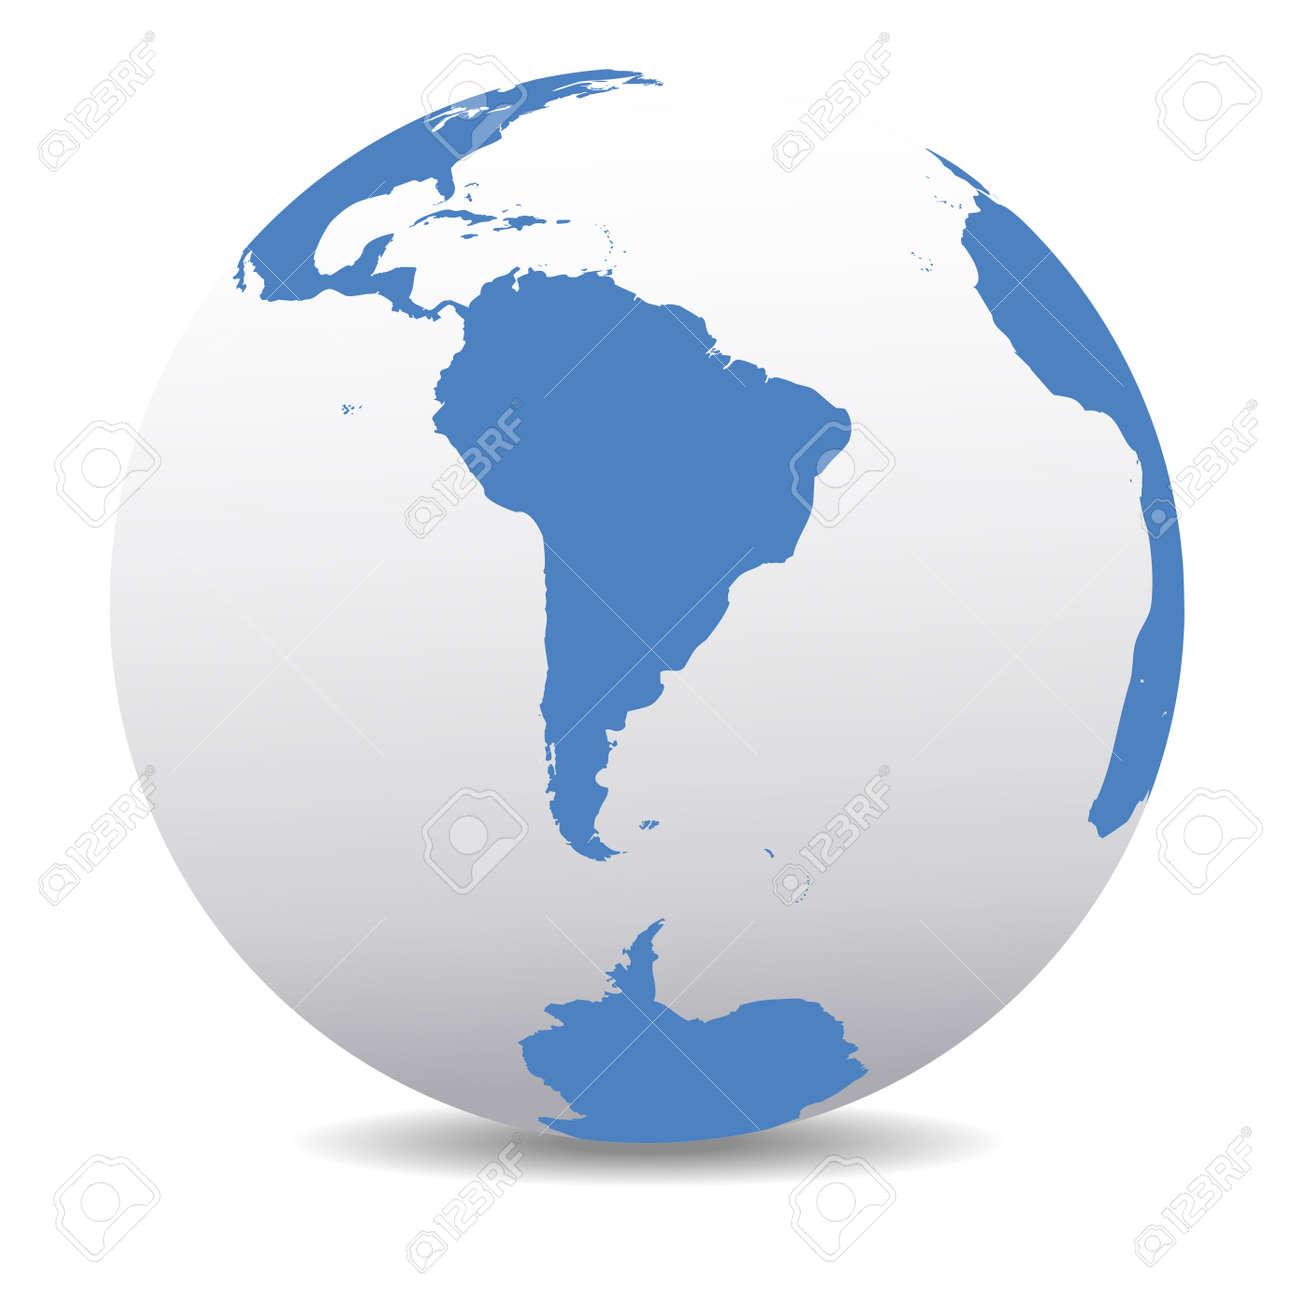 South America and South Pole Global World - 35579138